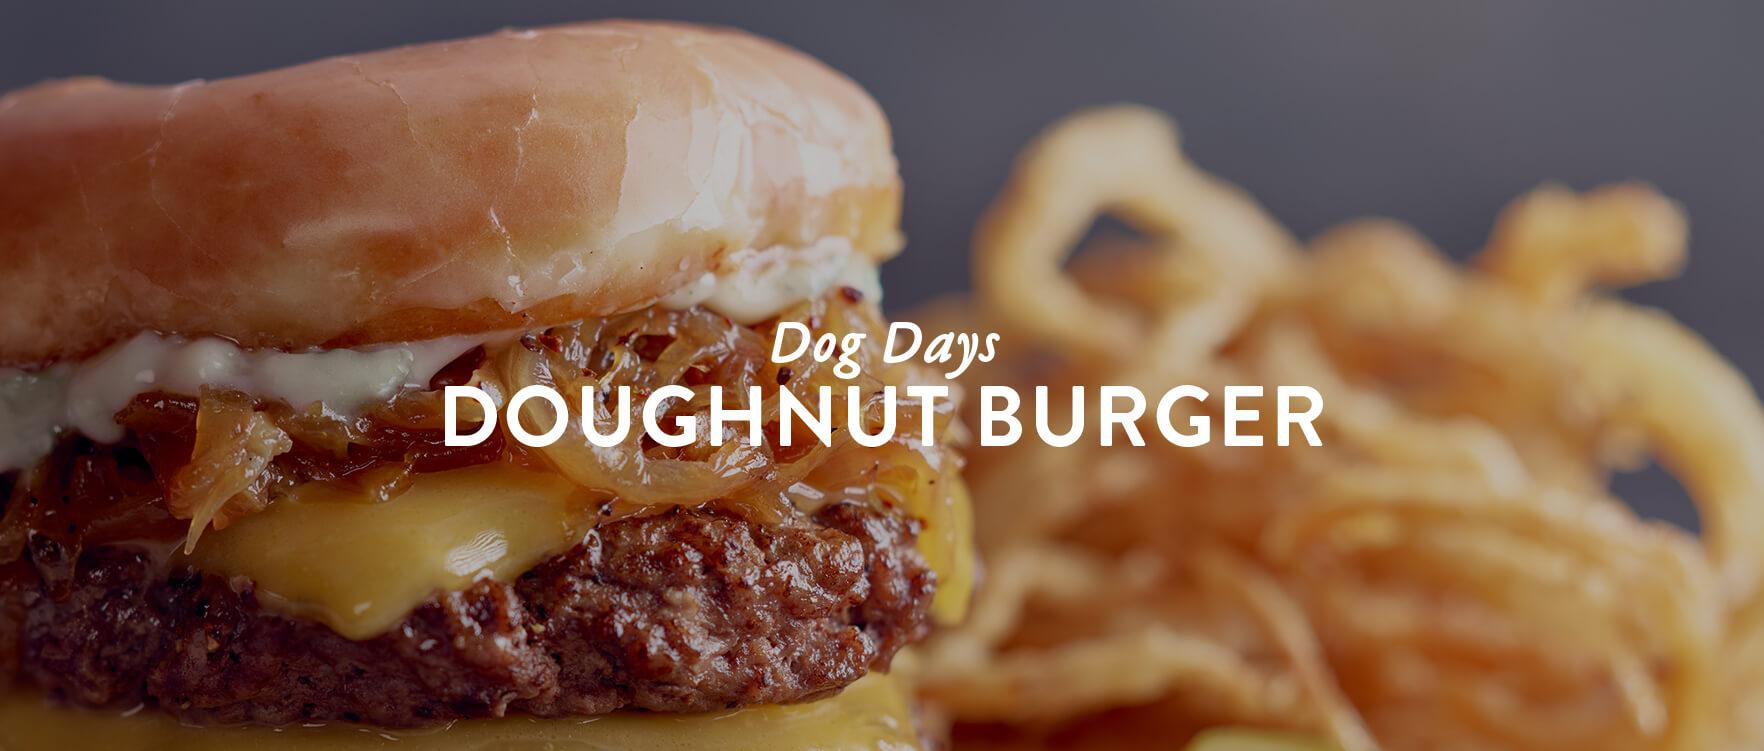 Dog Days Doughnut Burger